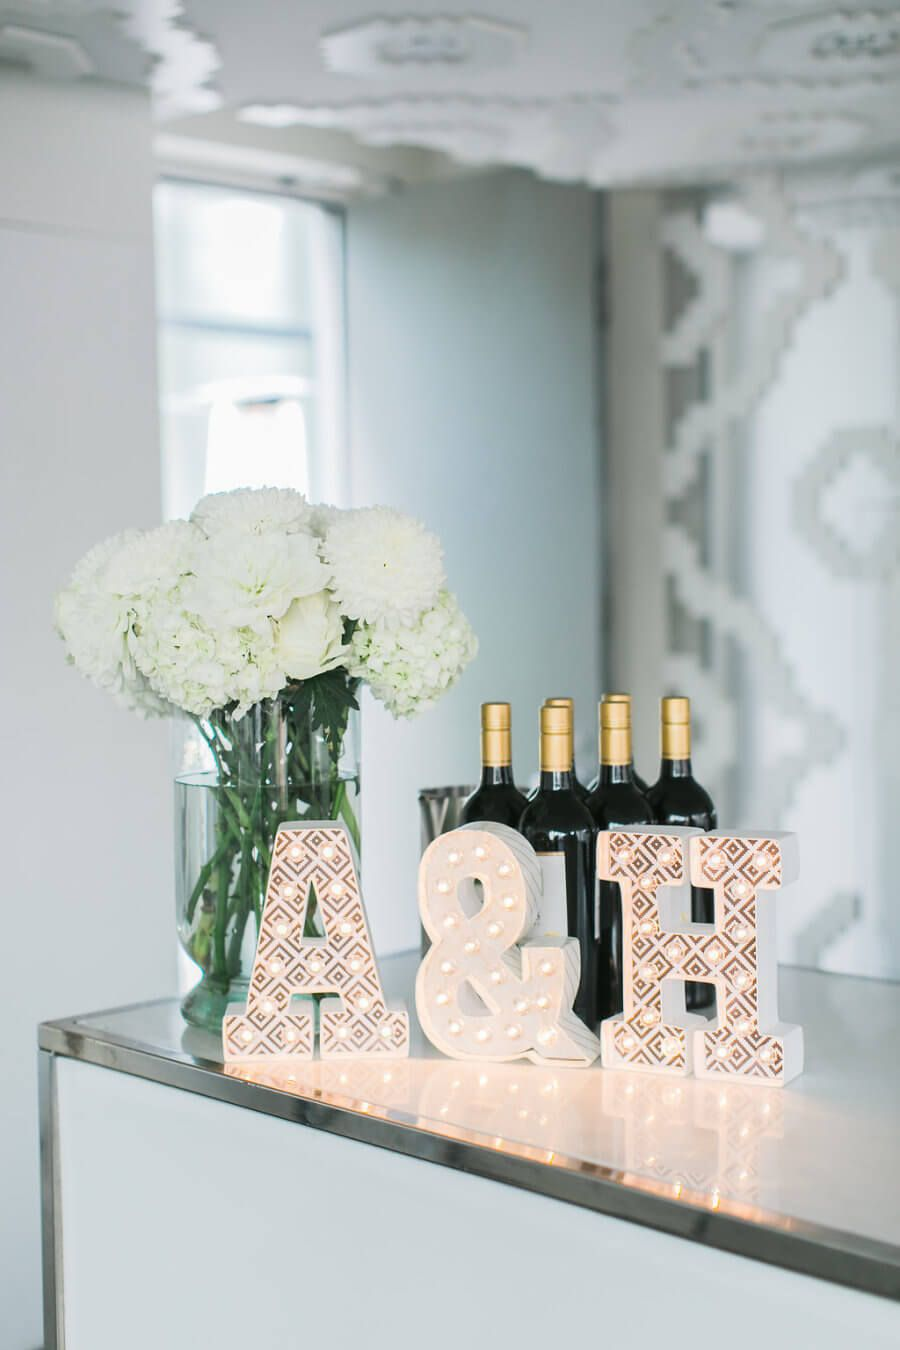 Flores e garrafas de bebida na festa de noivado simples